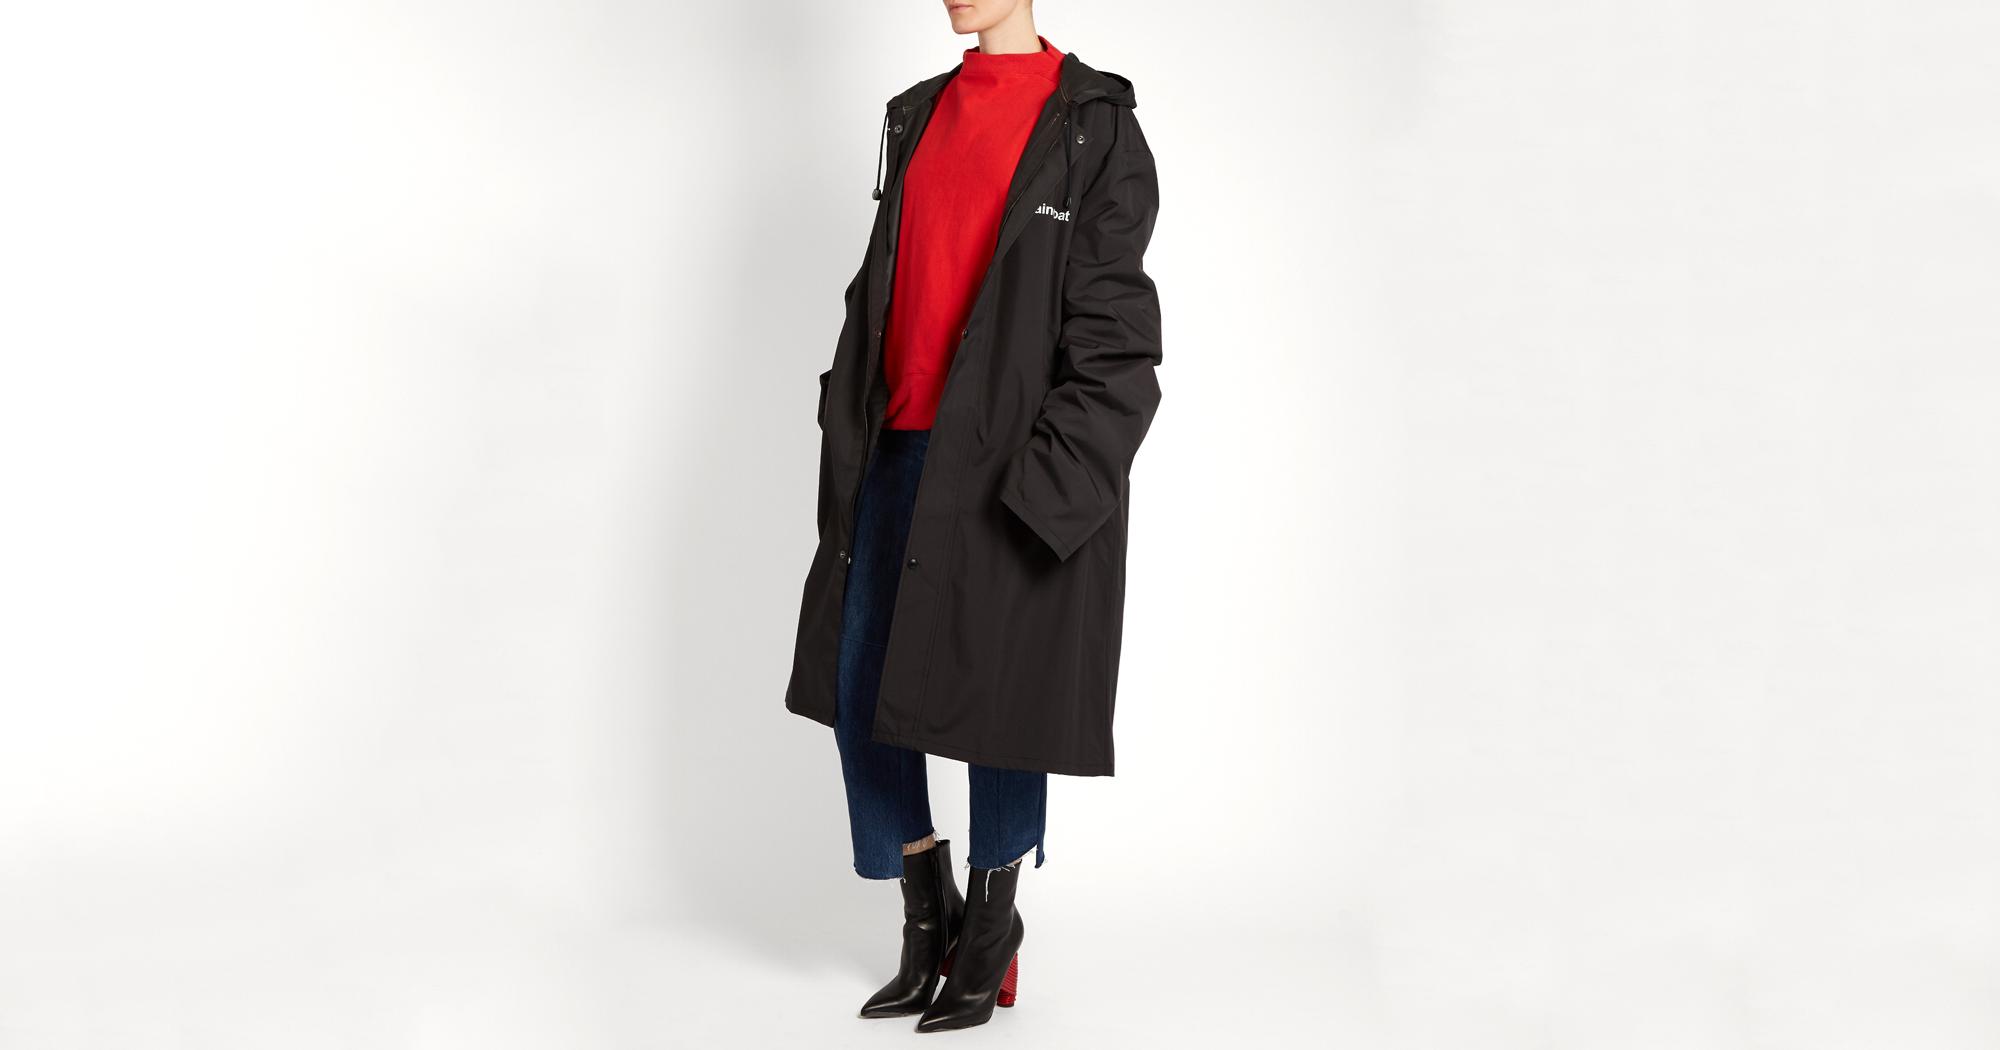 What To Wear In The Rain - Stylish Raincoats, Waterproof Jackets